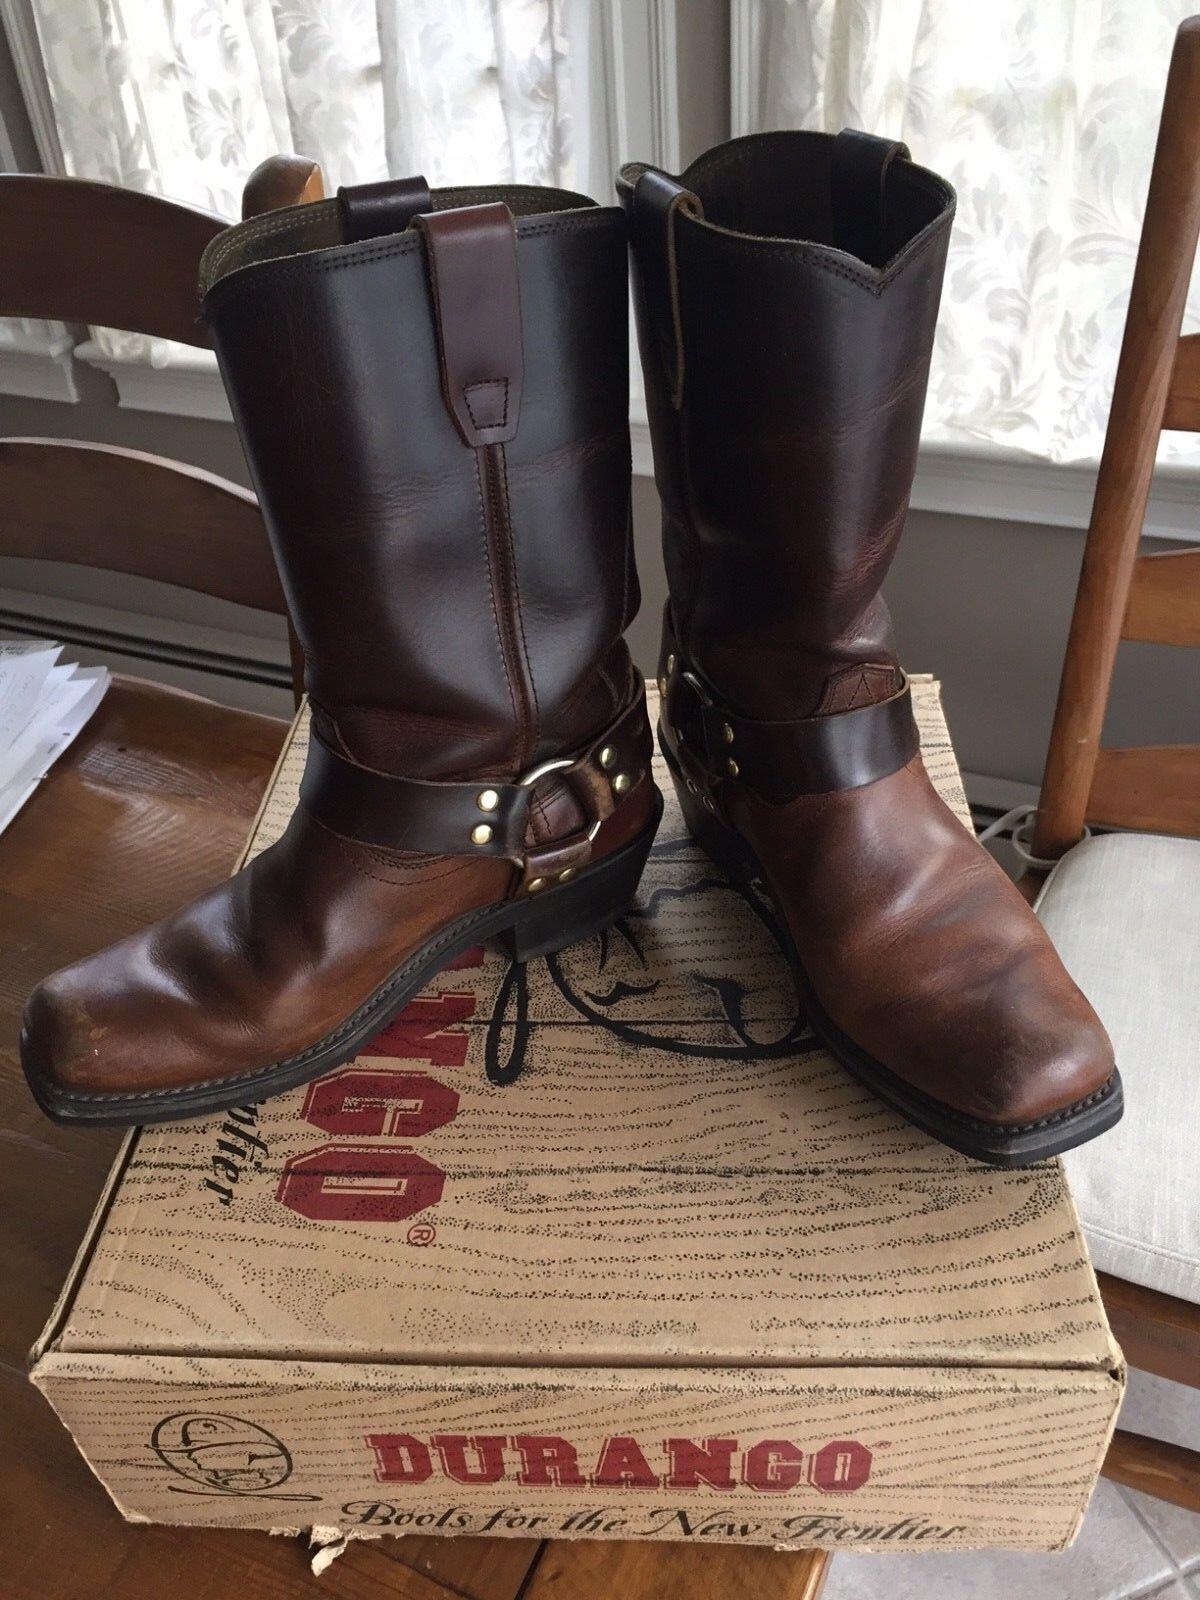 Durango women's gaucho harness BROWN boots size 7.5